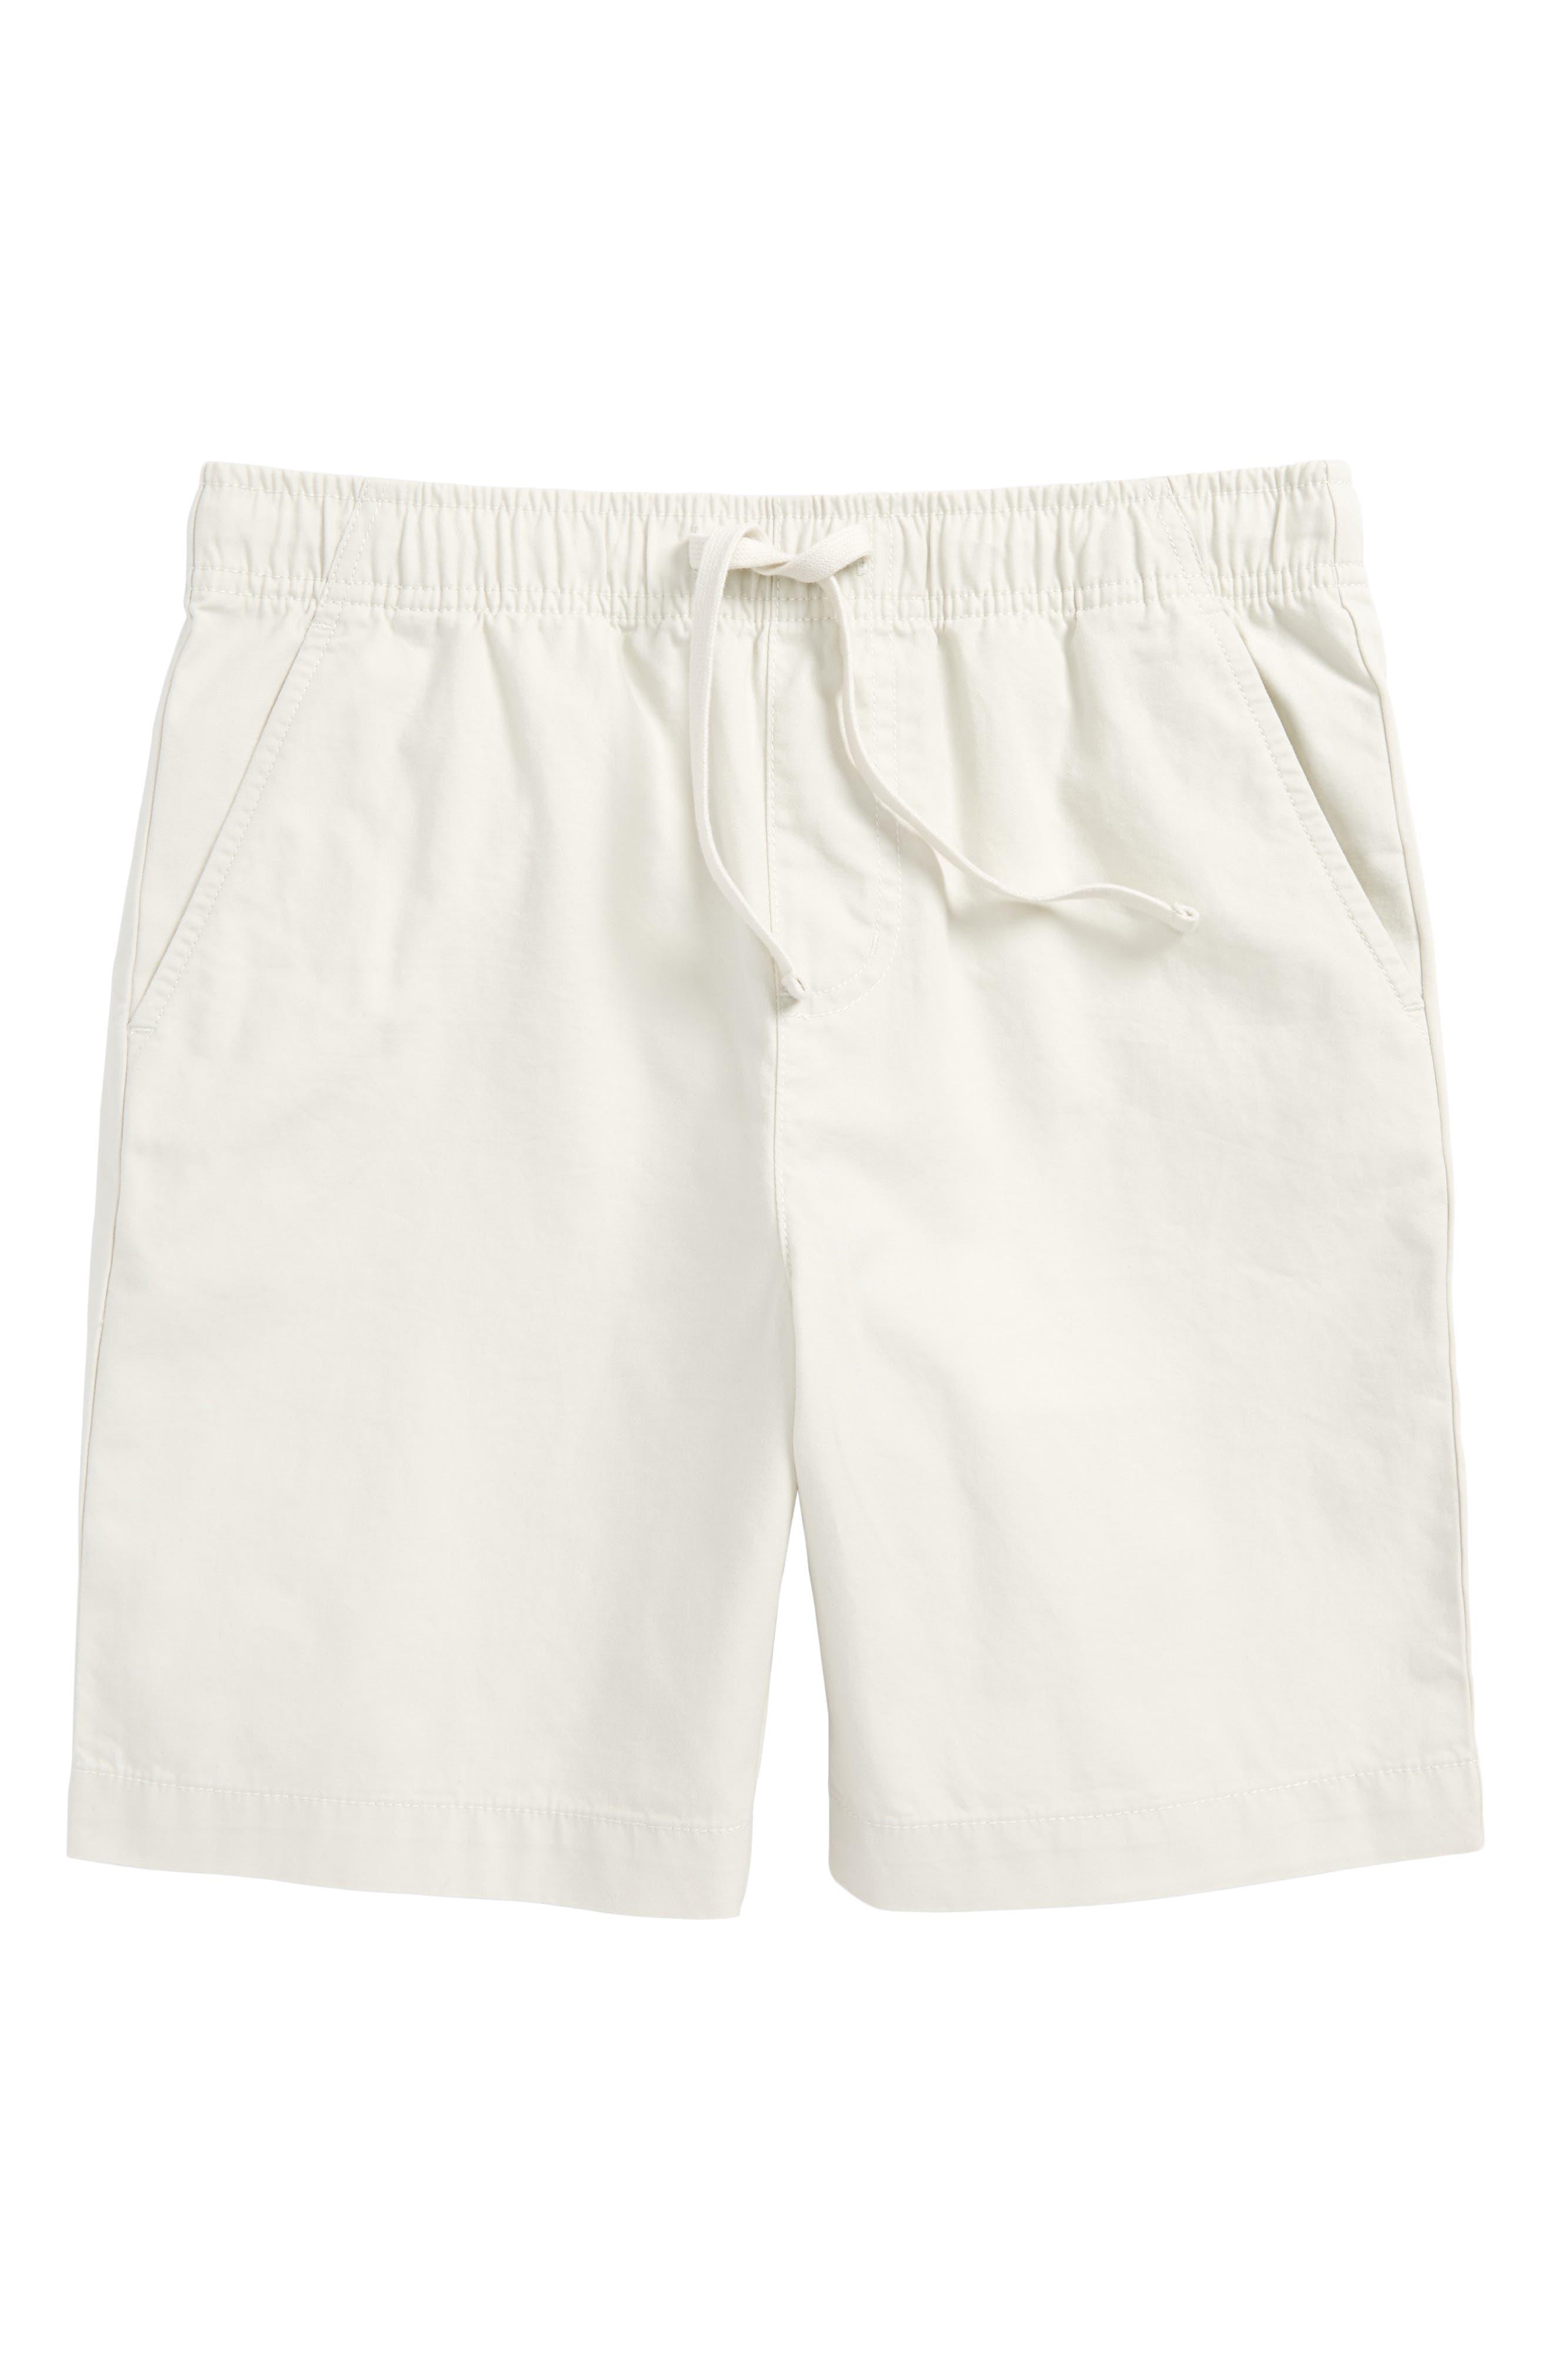 Main Image - Vineyard Vines Elastic Waist Shorts (Big Boys)